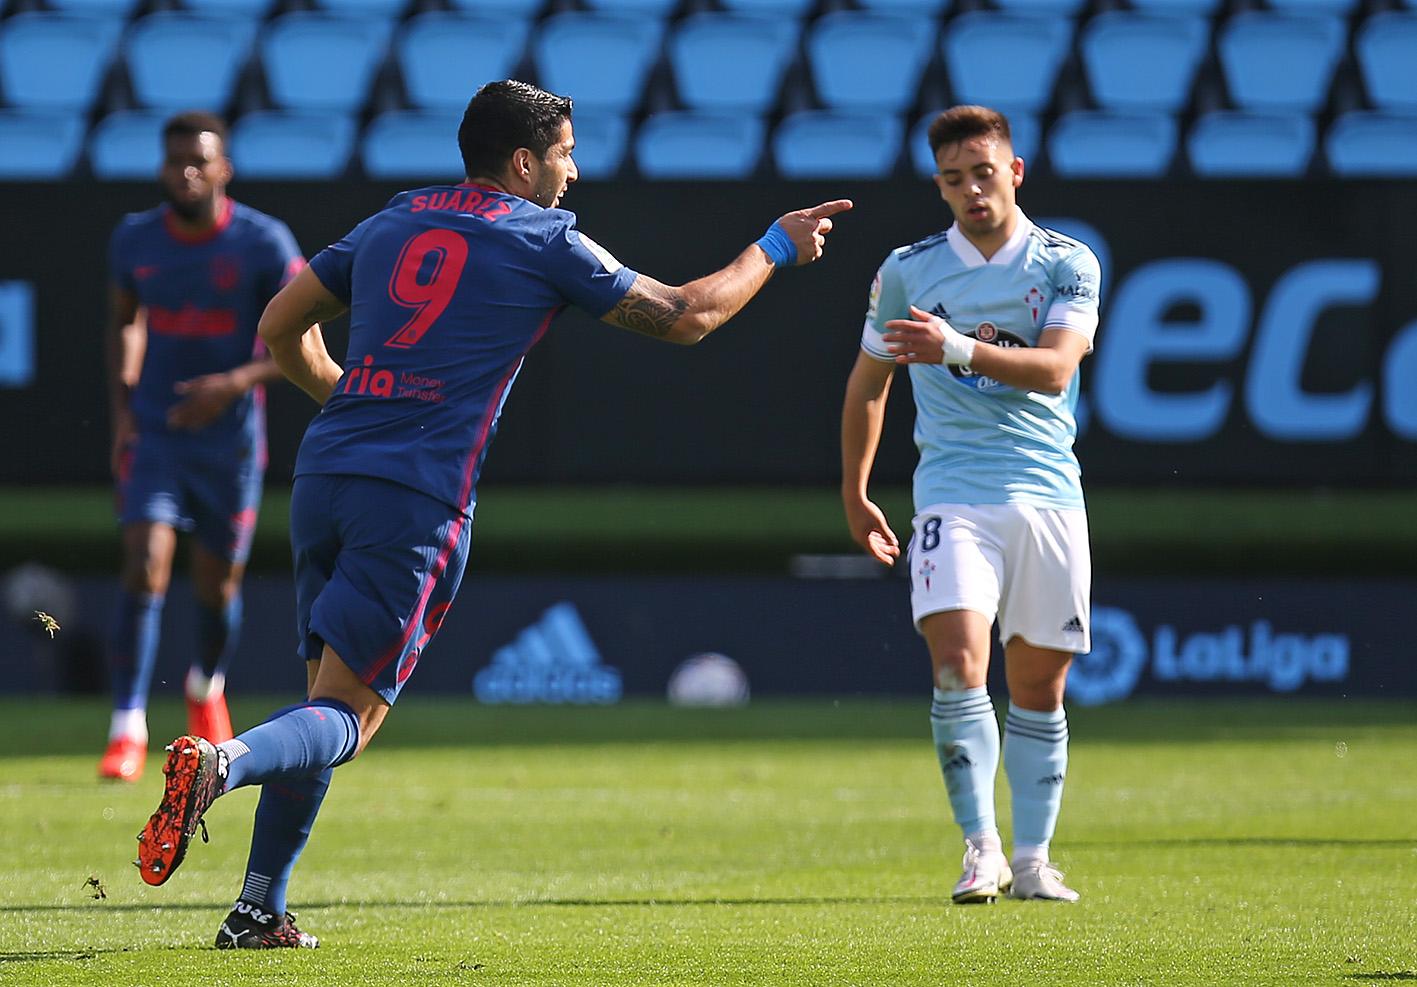 La Liga match report Game week 6